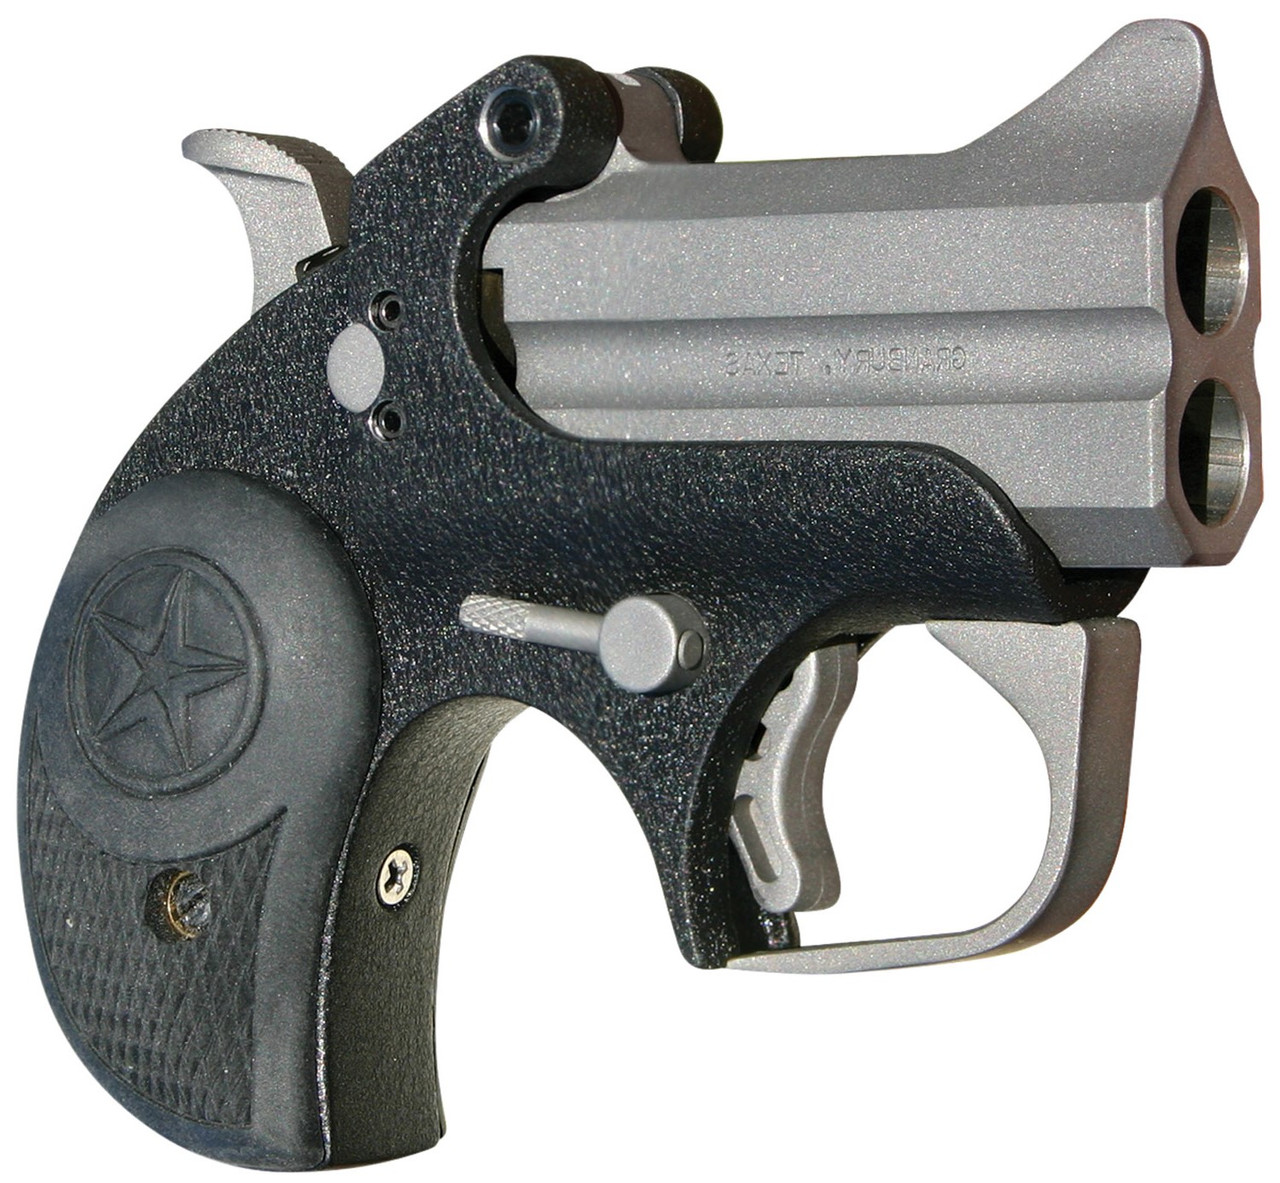 "Bond Arms Backup Original 2.5"" CALIFORNIA LEGAL - 9mm"